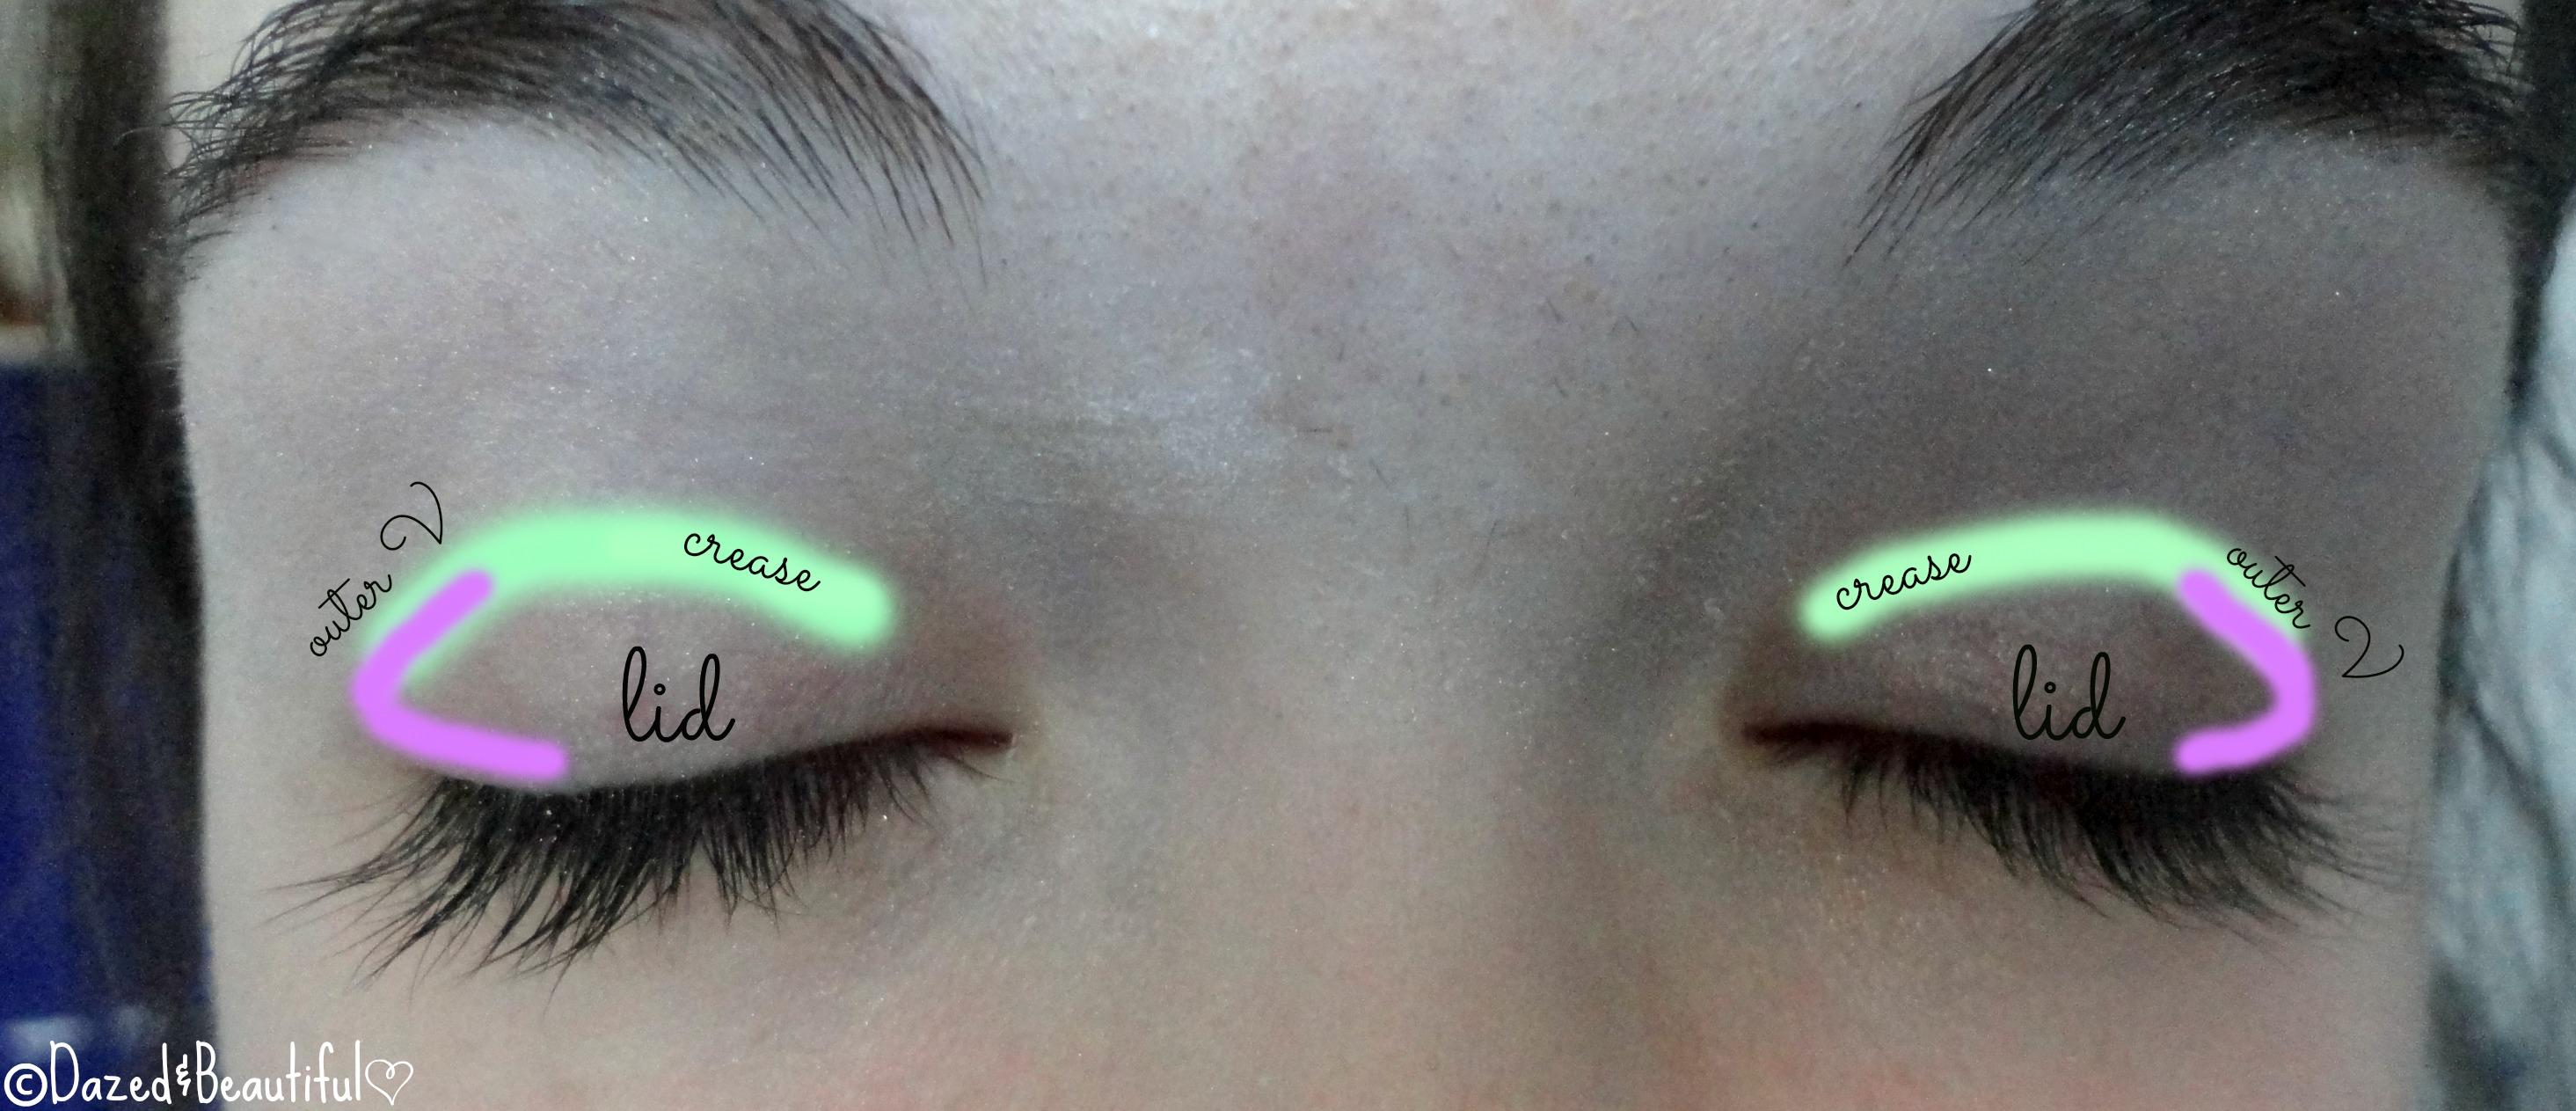 Smokey eye makeup dazedbeautiful demonstraion geenschuldenfo Gallery